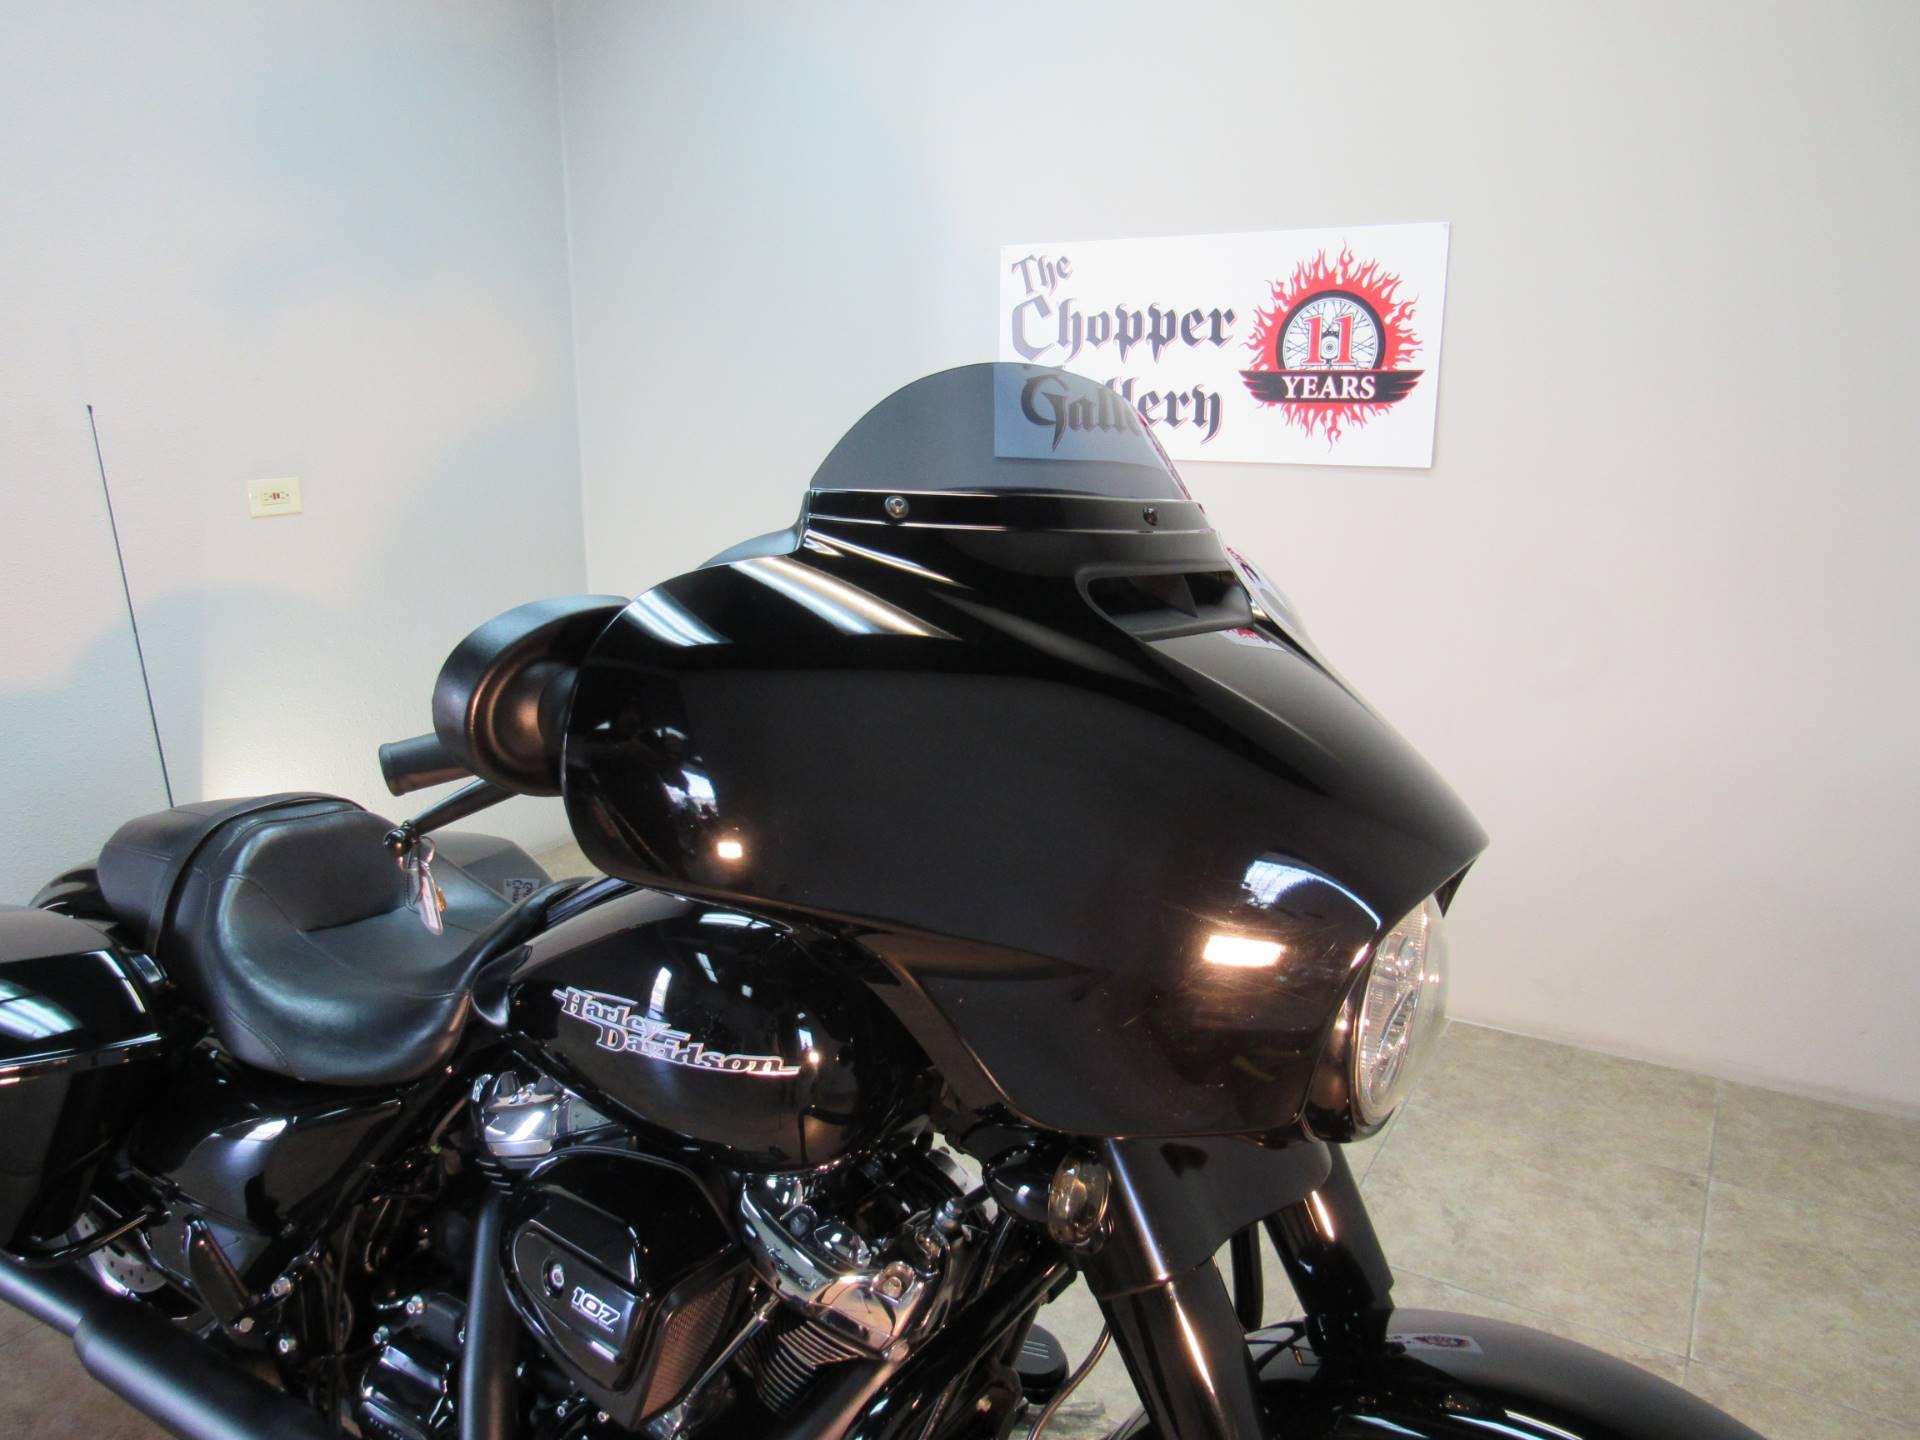 2018 Harley-Davidson Street Glide Special 11